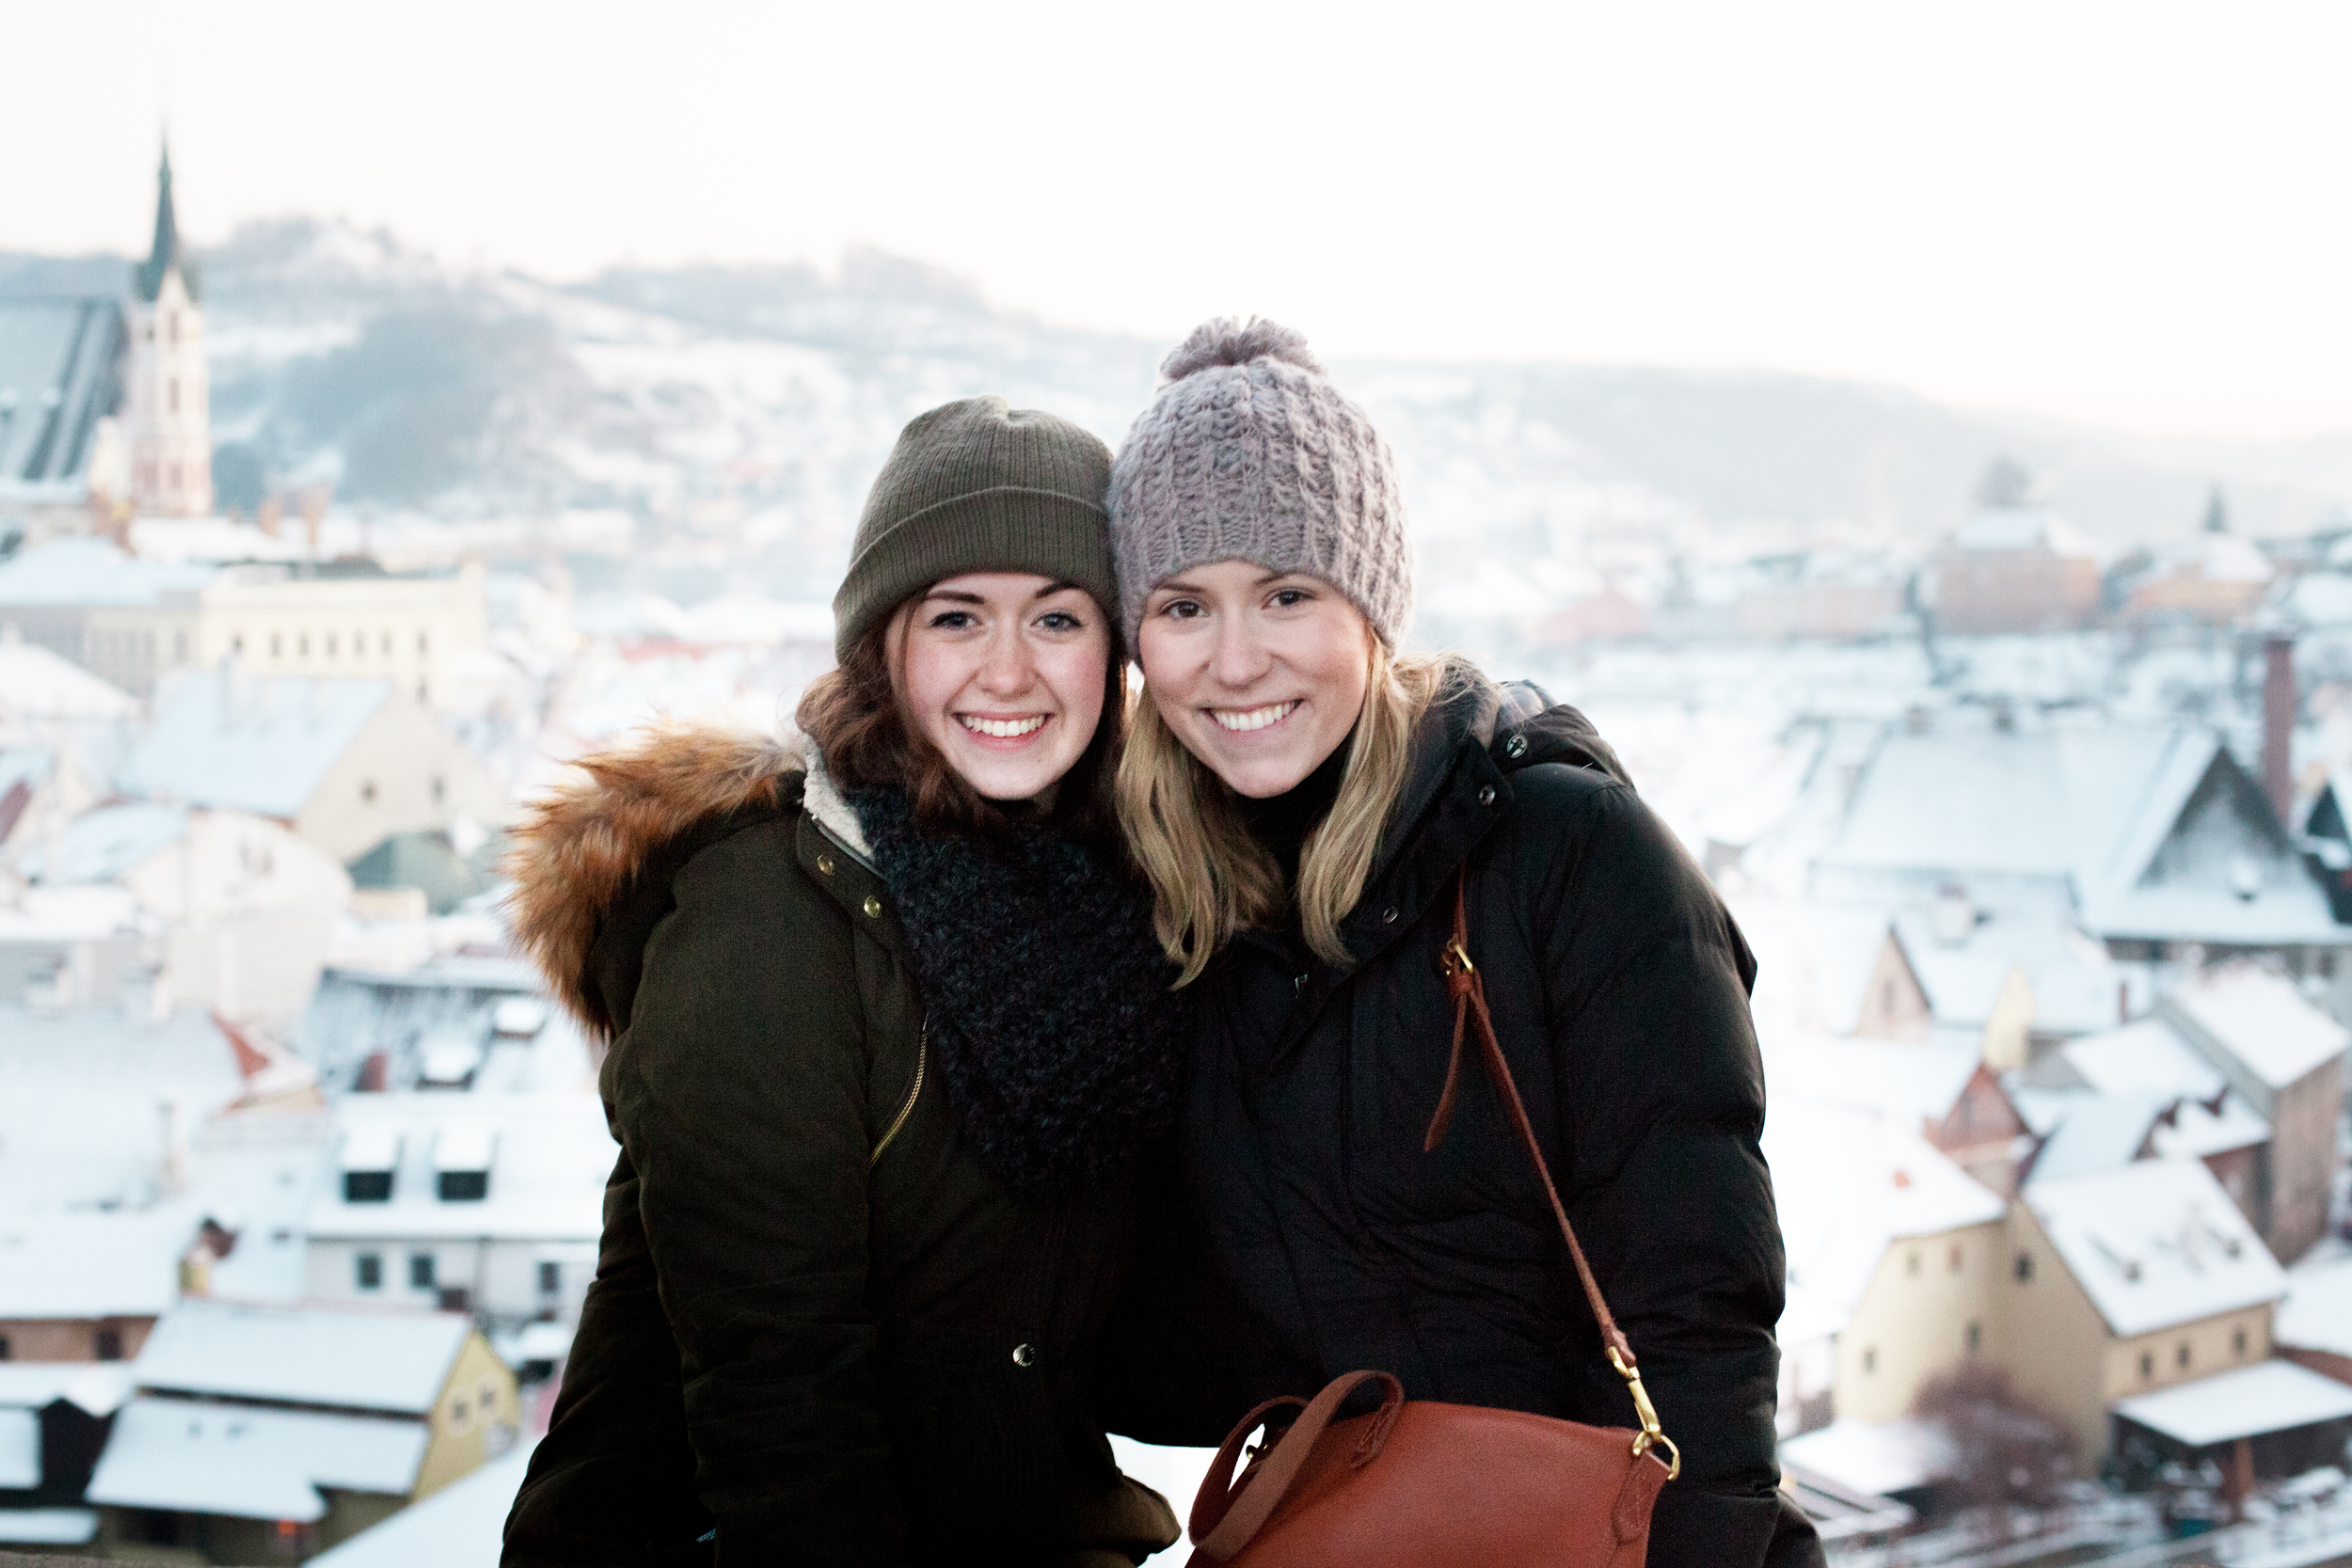 Me and my friend Megan enjoying views atop the Český Krumlov castle.